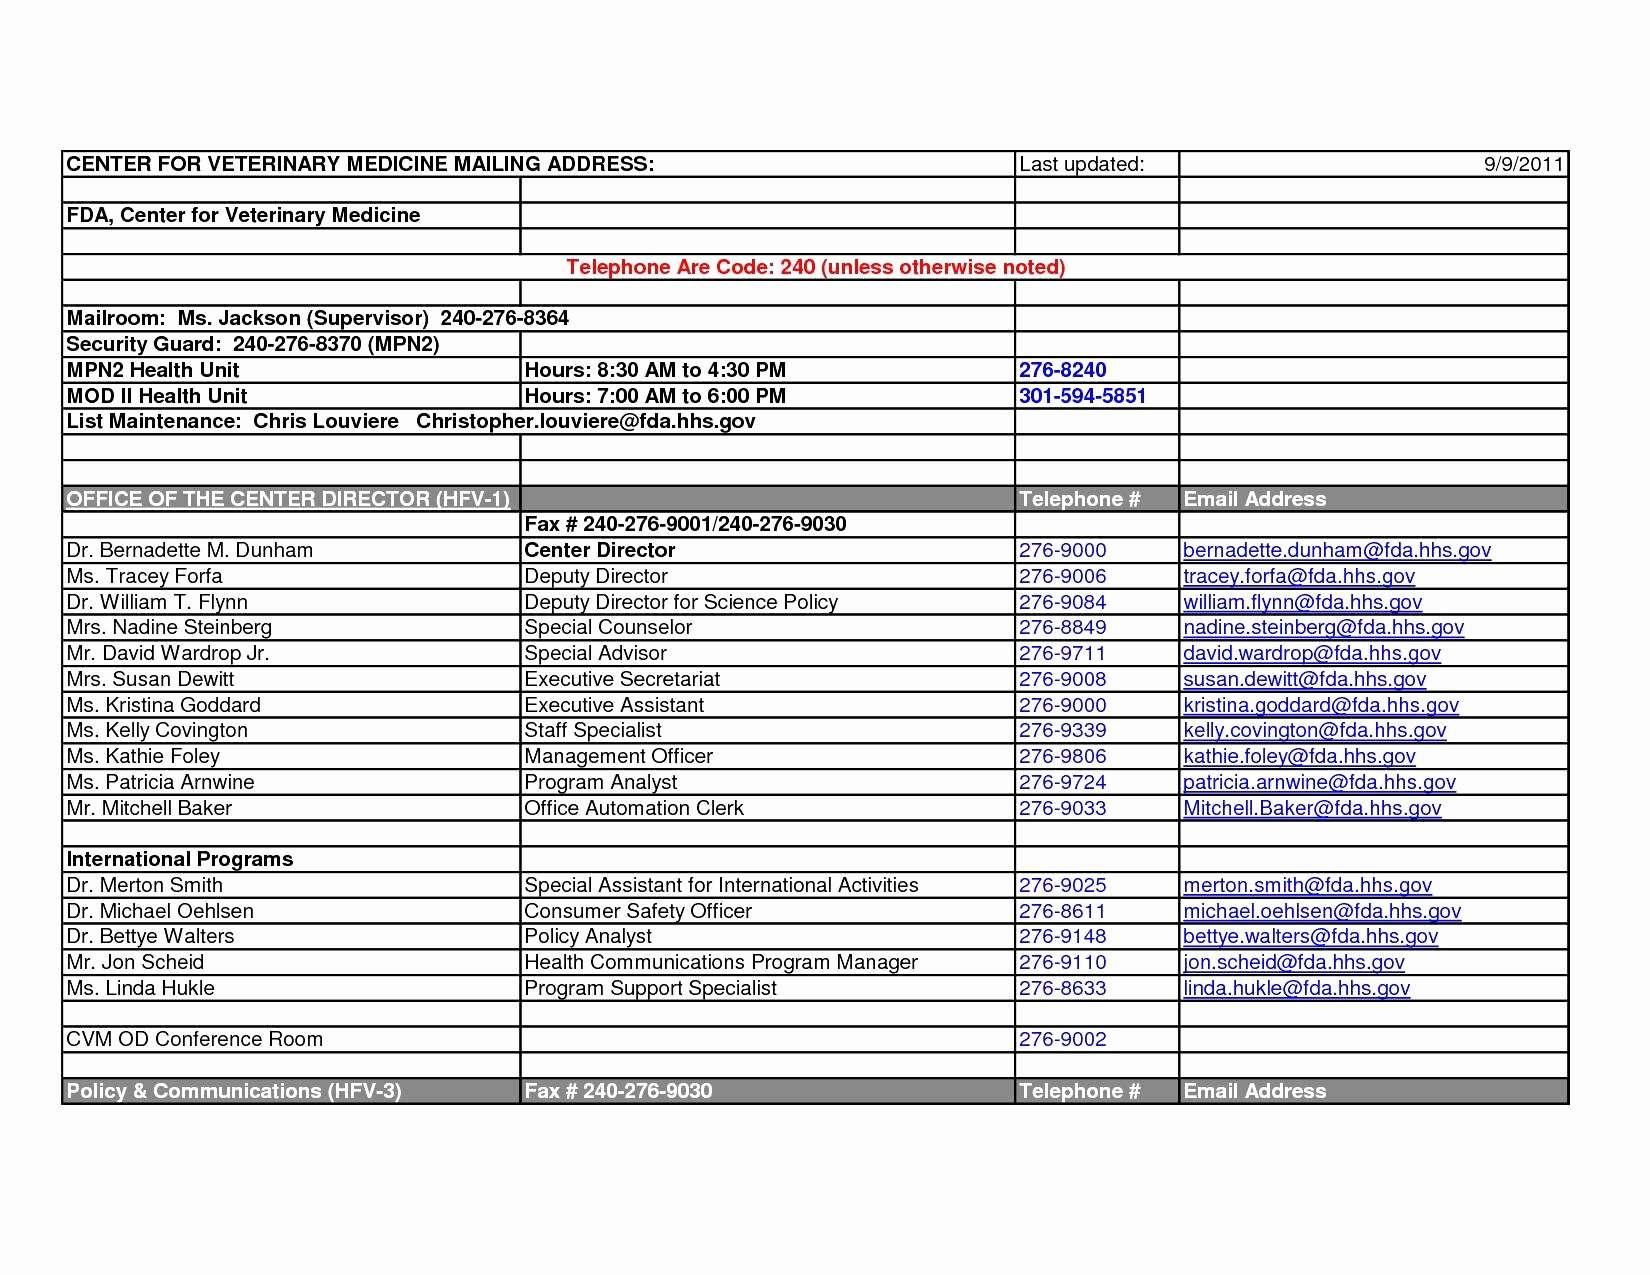 Uber Driver Spreadsheet Within Uber Driver Spreadsheet And Truck Driver Accounting Spreadsheet